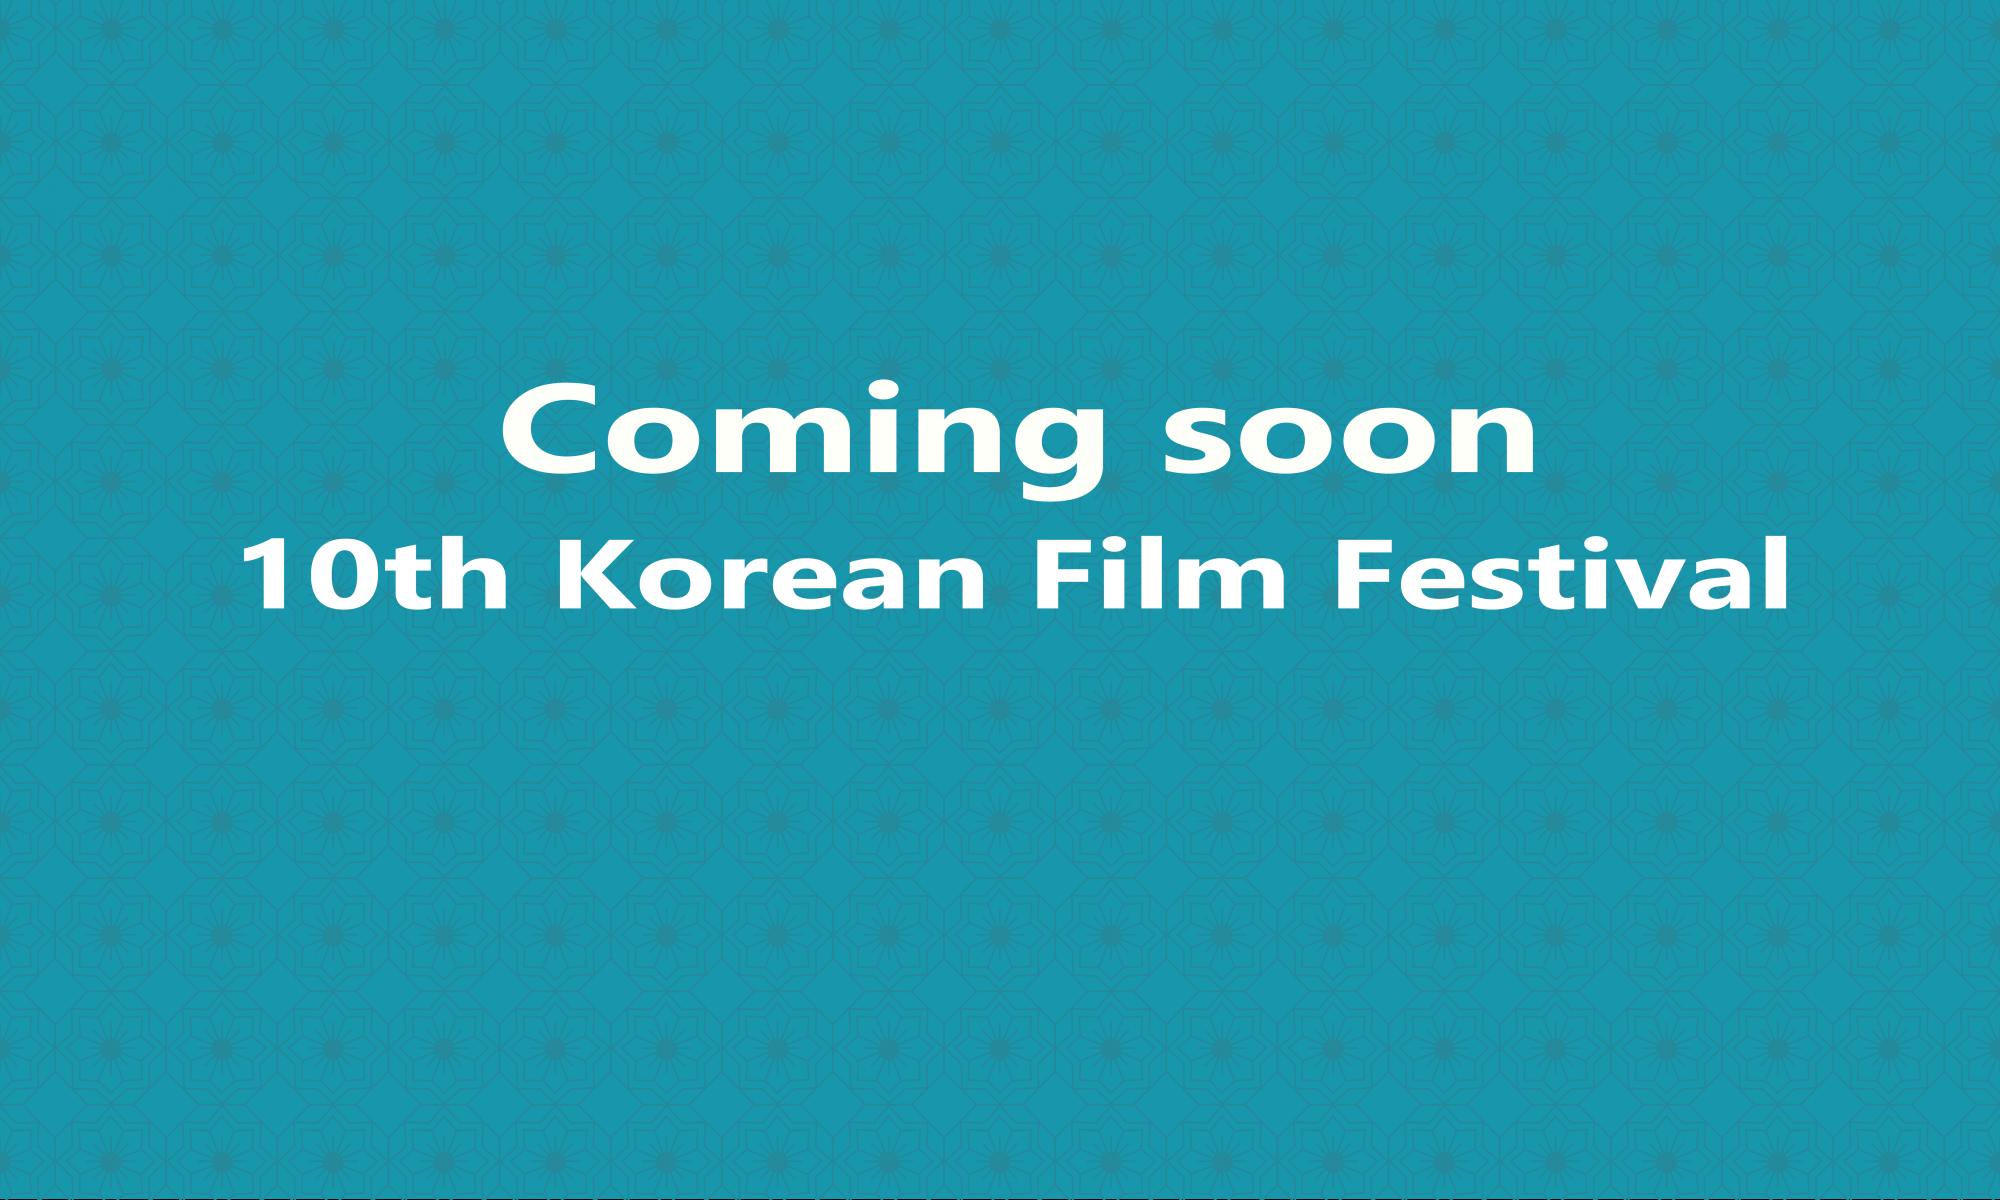 Project K 10th Korean Film Festival